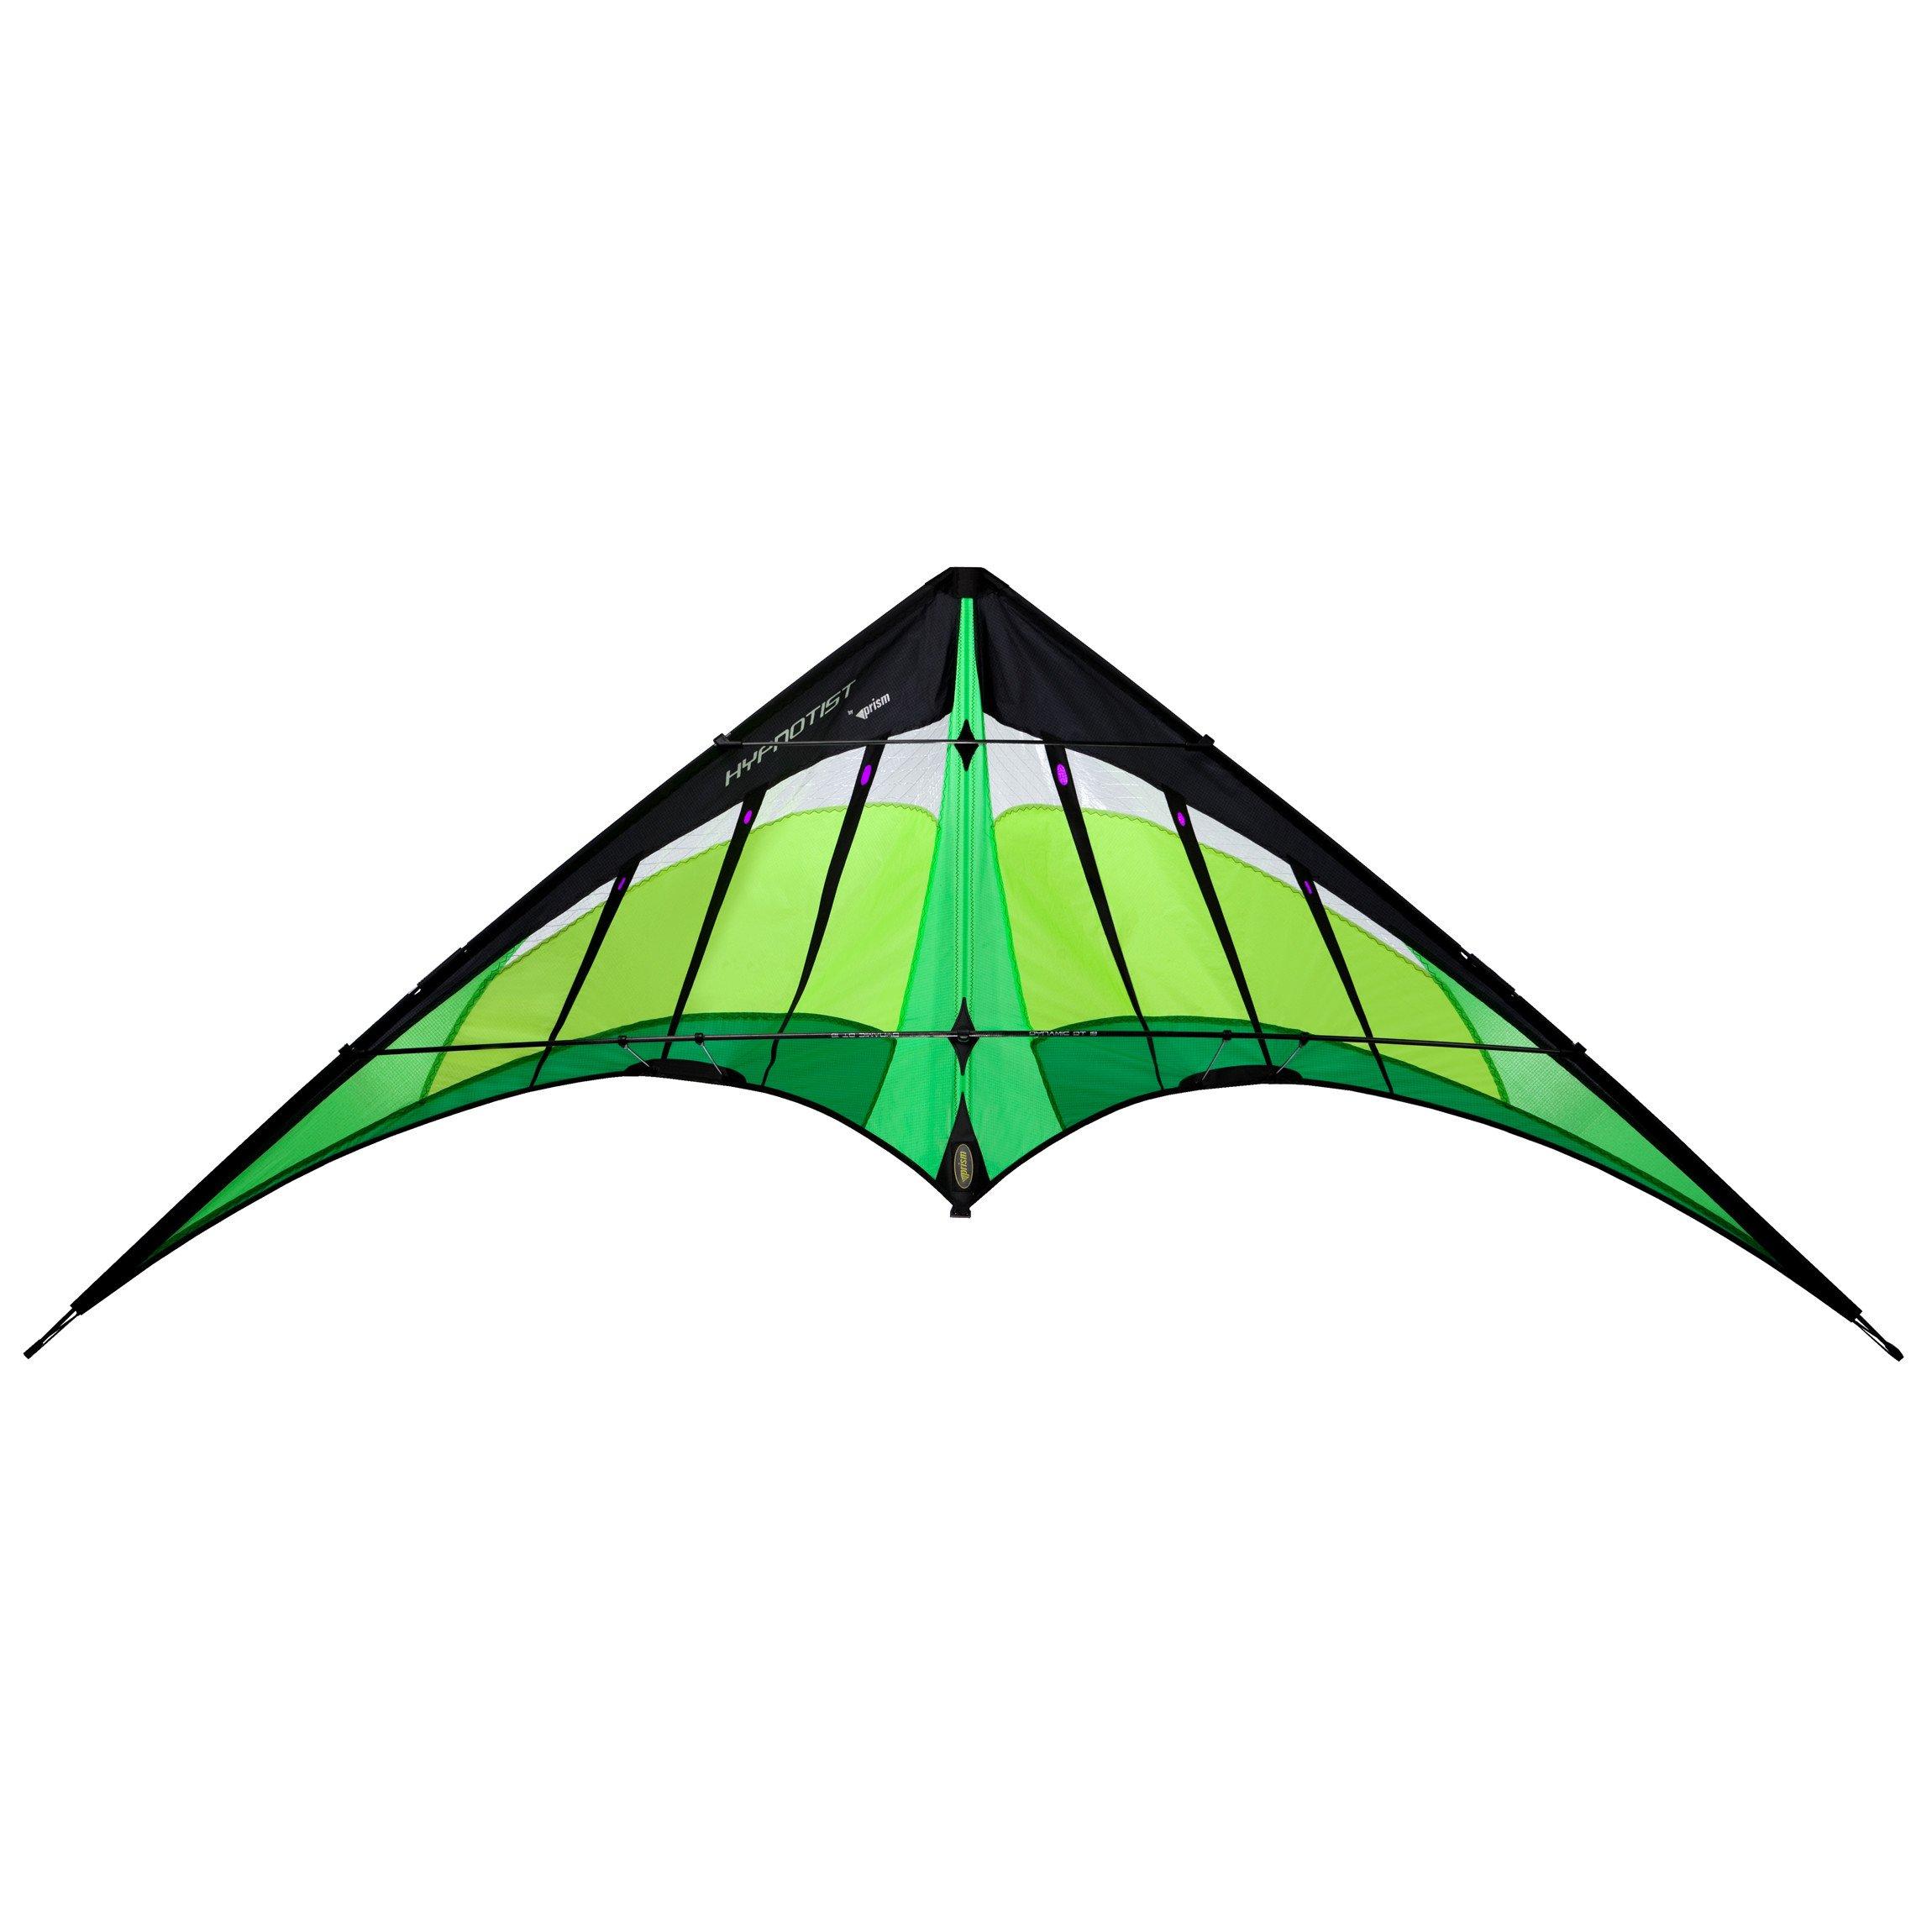 Prism Hypnotist Dual-line Stunt Kite, Citrus by Prism Kite Technology (Image #1)